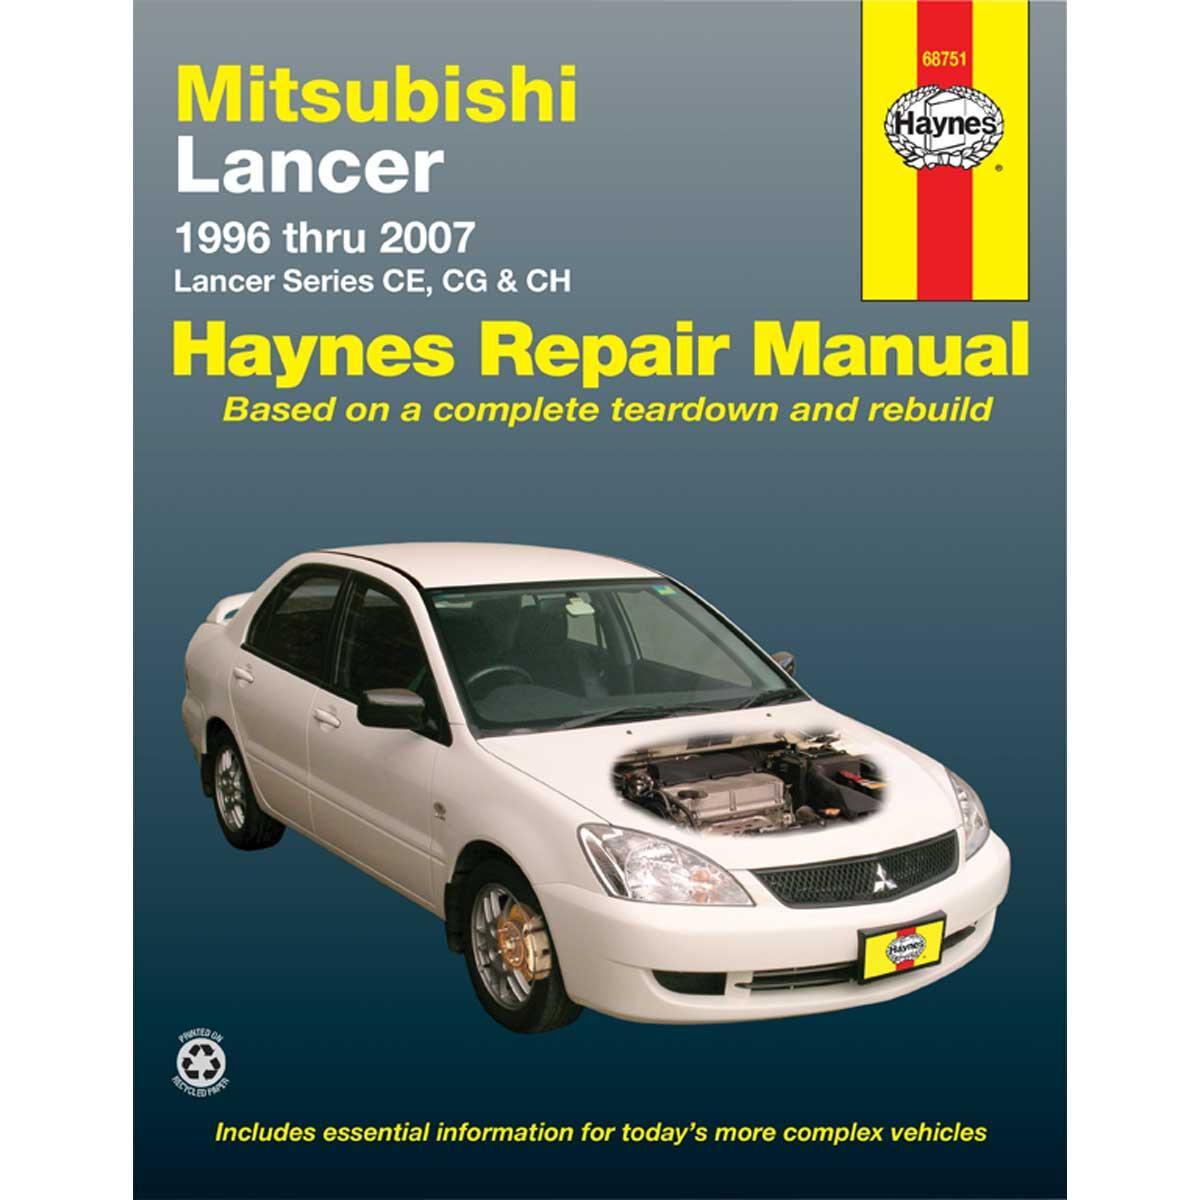 mitsubishi lancer 2009 owners manual one word quickstart guide book u2022 rh kelvinatawura co uk mitsubishi lancer 2009 service manual pdf Used 2009 Mitsubishi Lancer